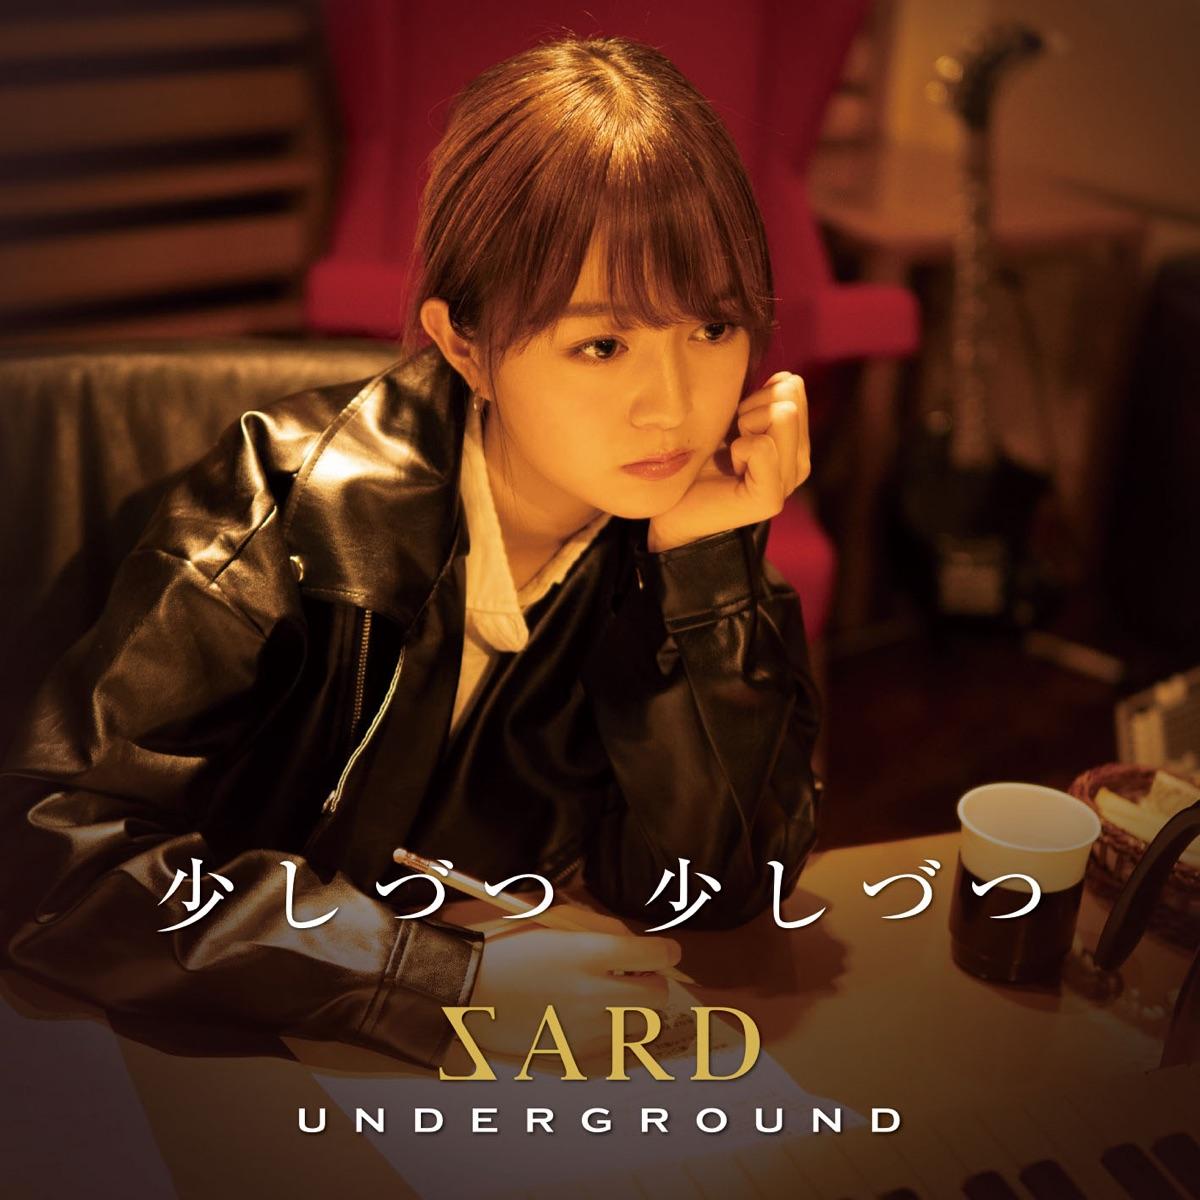 『SARD UNDERGROUND - 少しづつ 少しづつ 歌詞』収録の『少しづつ 少しづつ』ジャケット